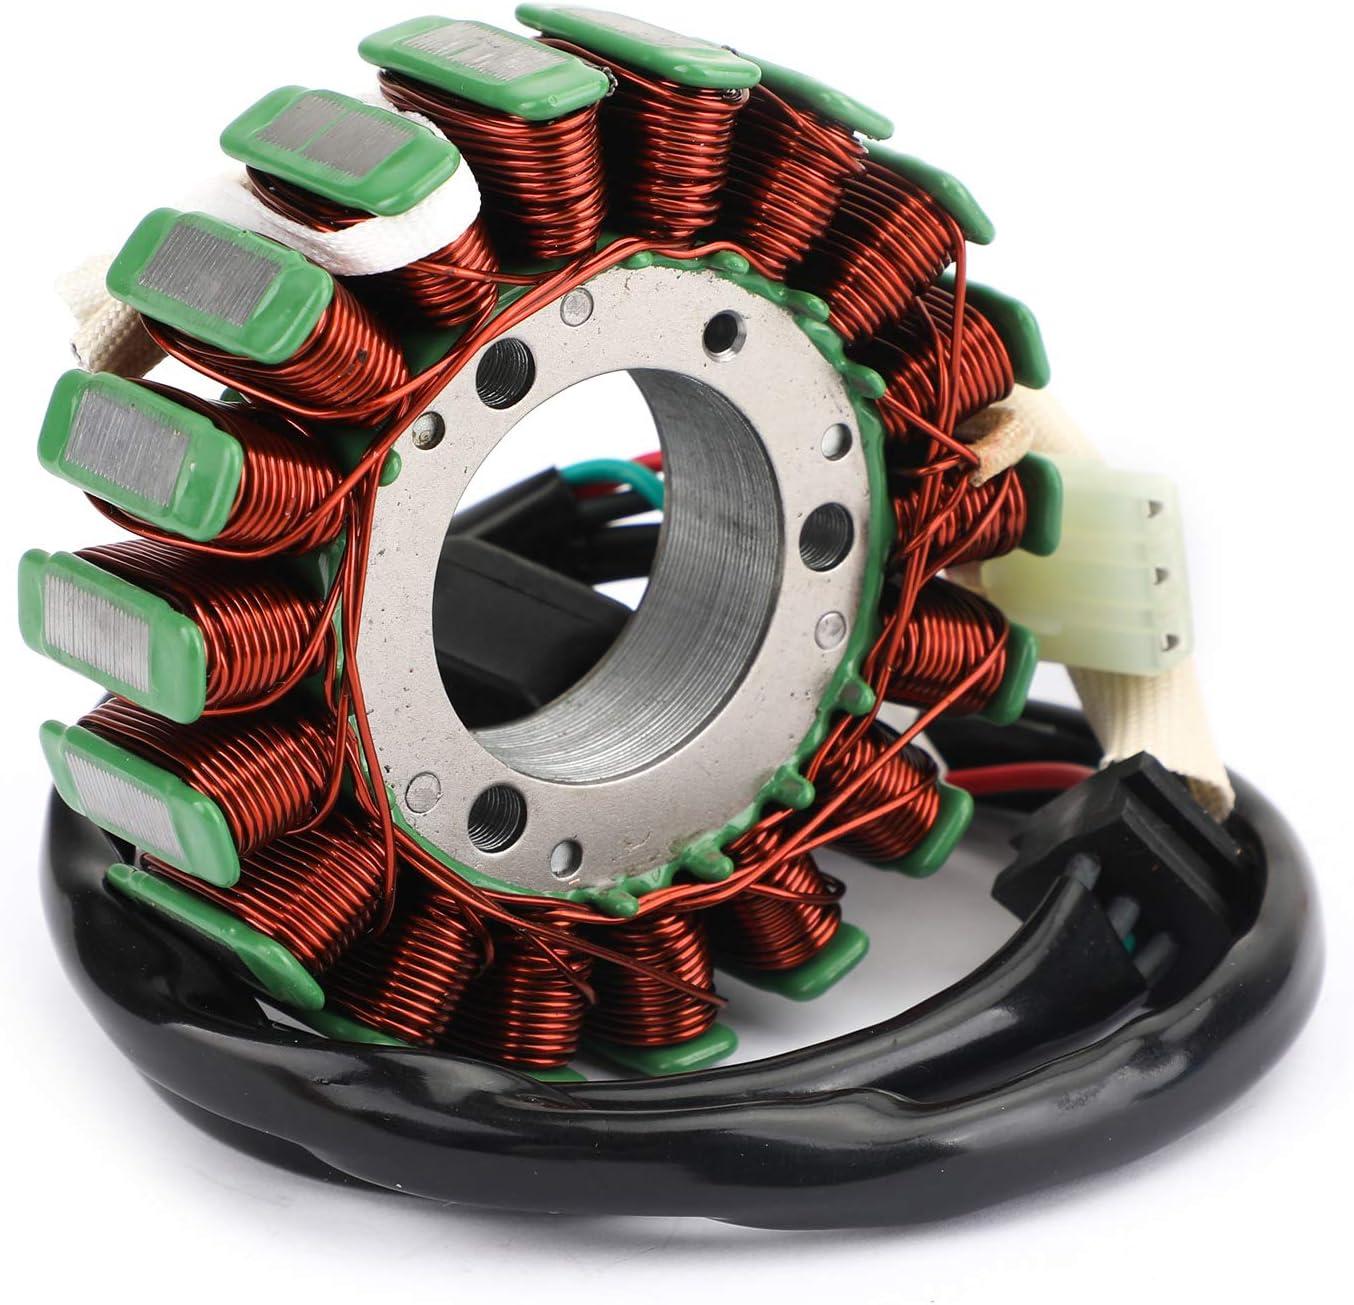 5 Dr/ähte 250 EXC-F Six Days 2012-2018 77539004000 77439004000 Artudatech Motorstator Magnet-Generator Motor-Stator passt f/ür K-T-M 250 XCF-W 2013-2016